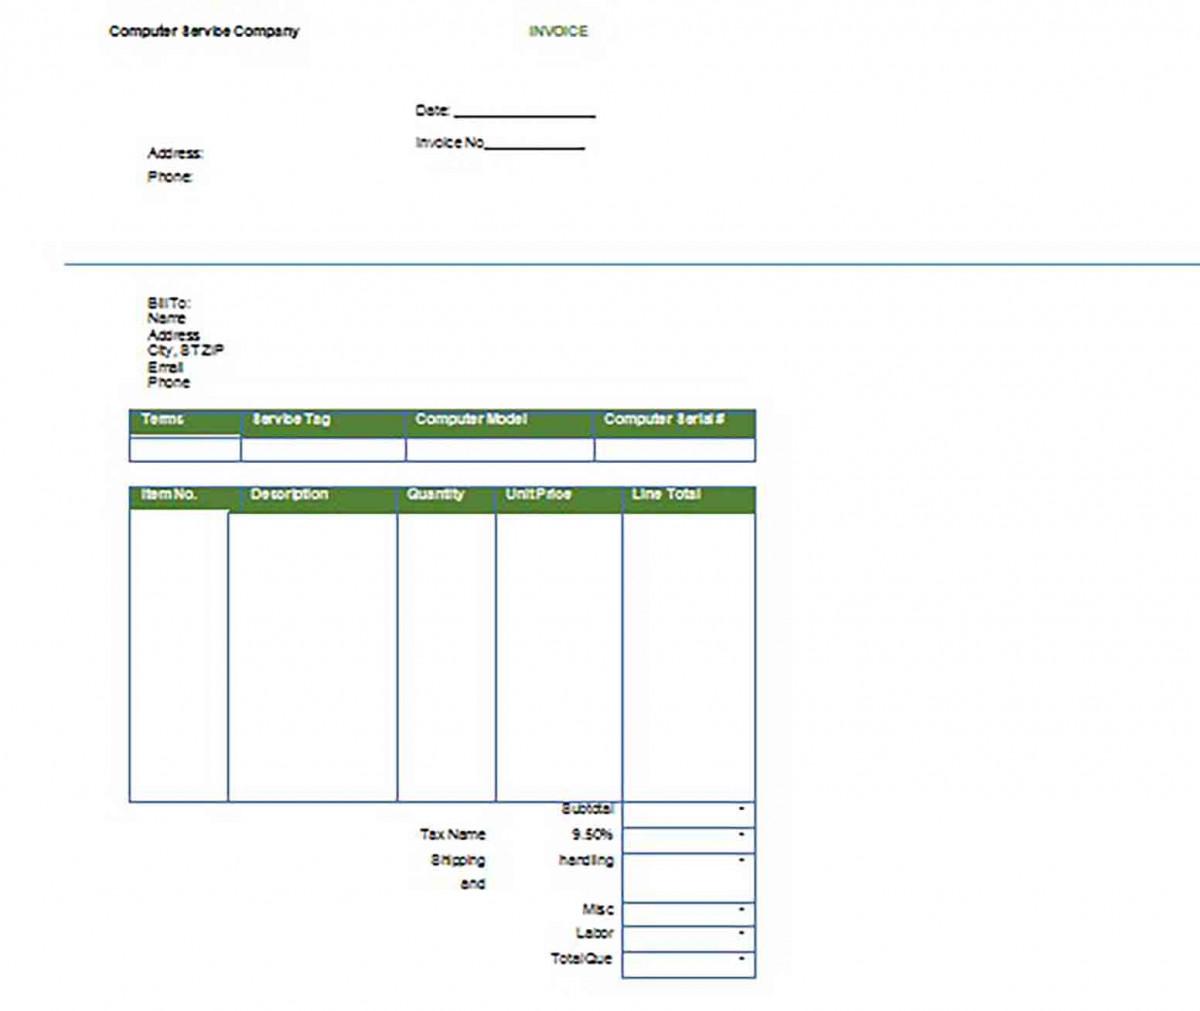 Printable Google Invoice templates